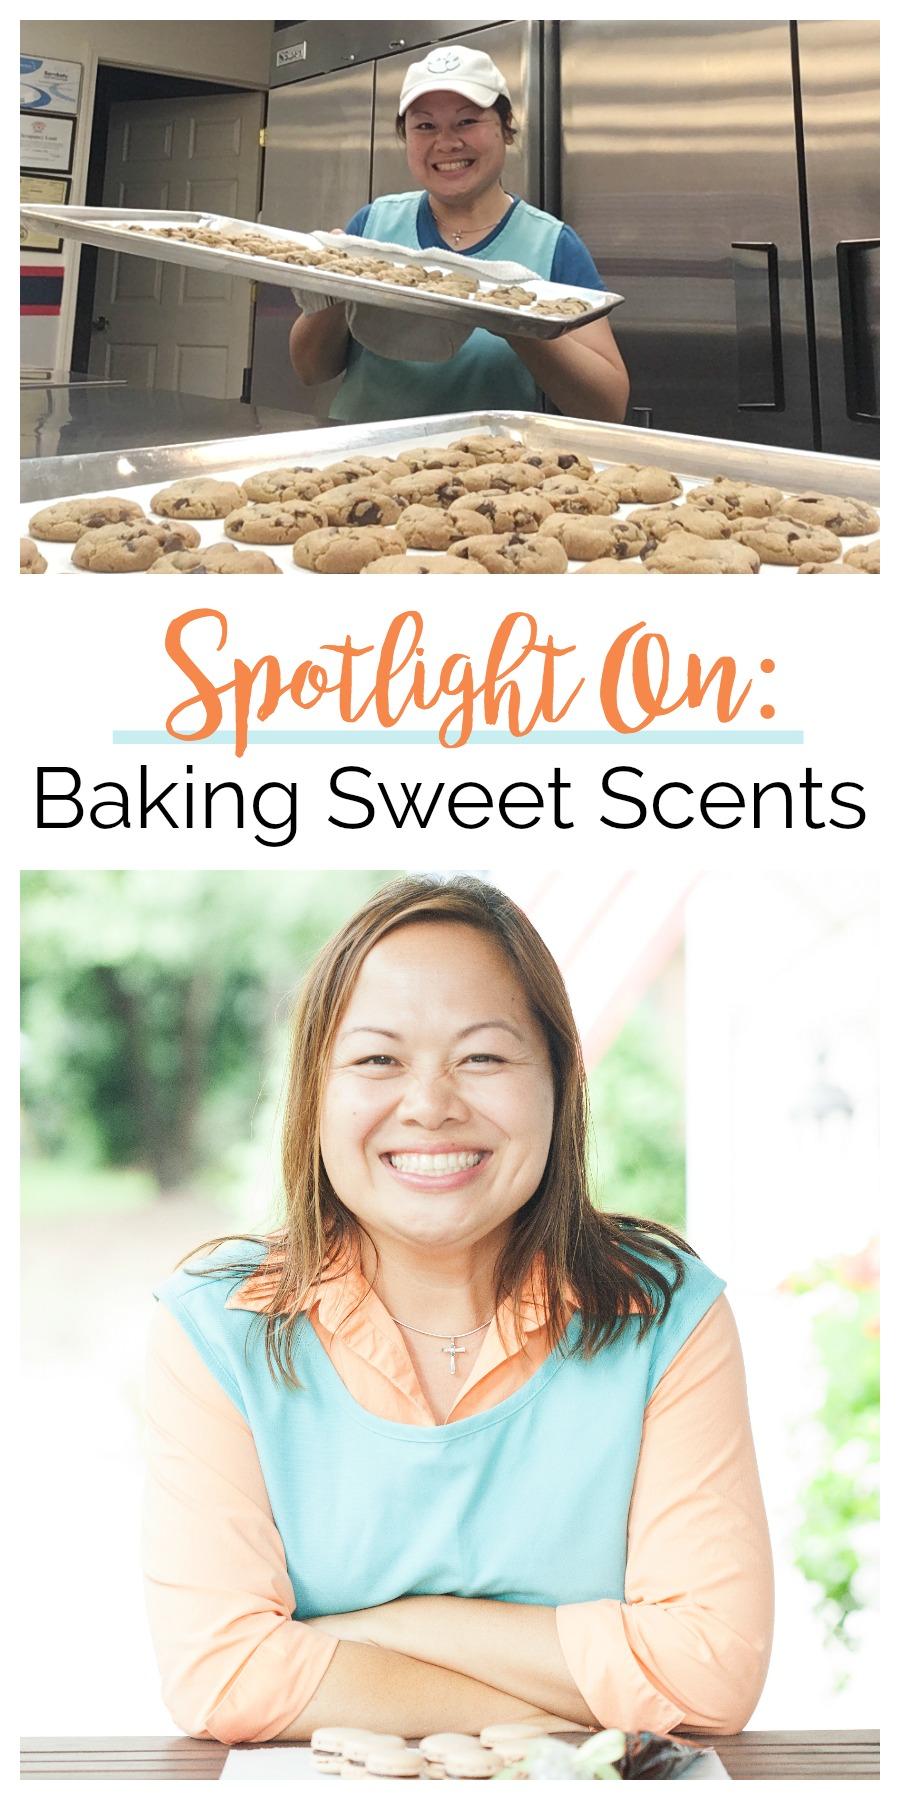 Spotlight On: Baking Sweet Scents | Palmetto State Weddings